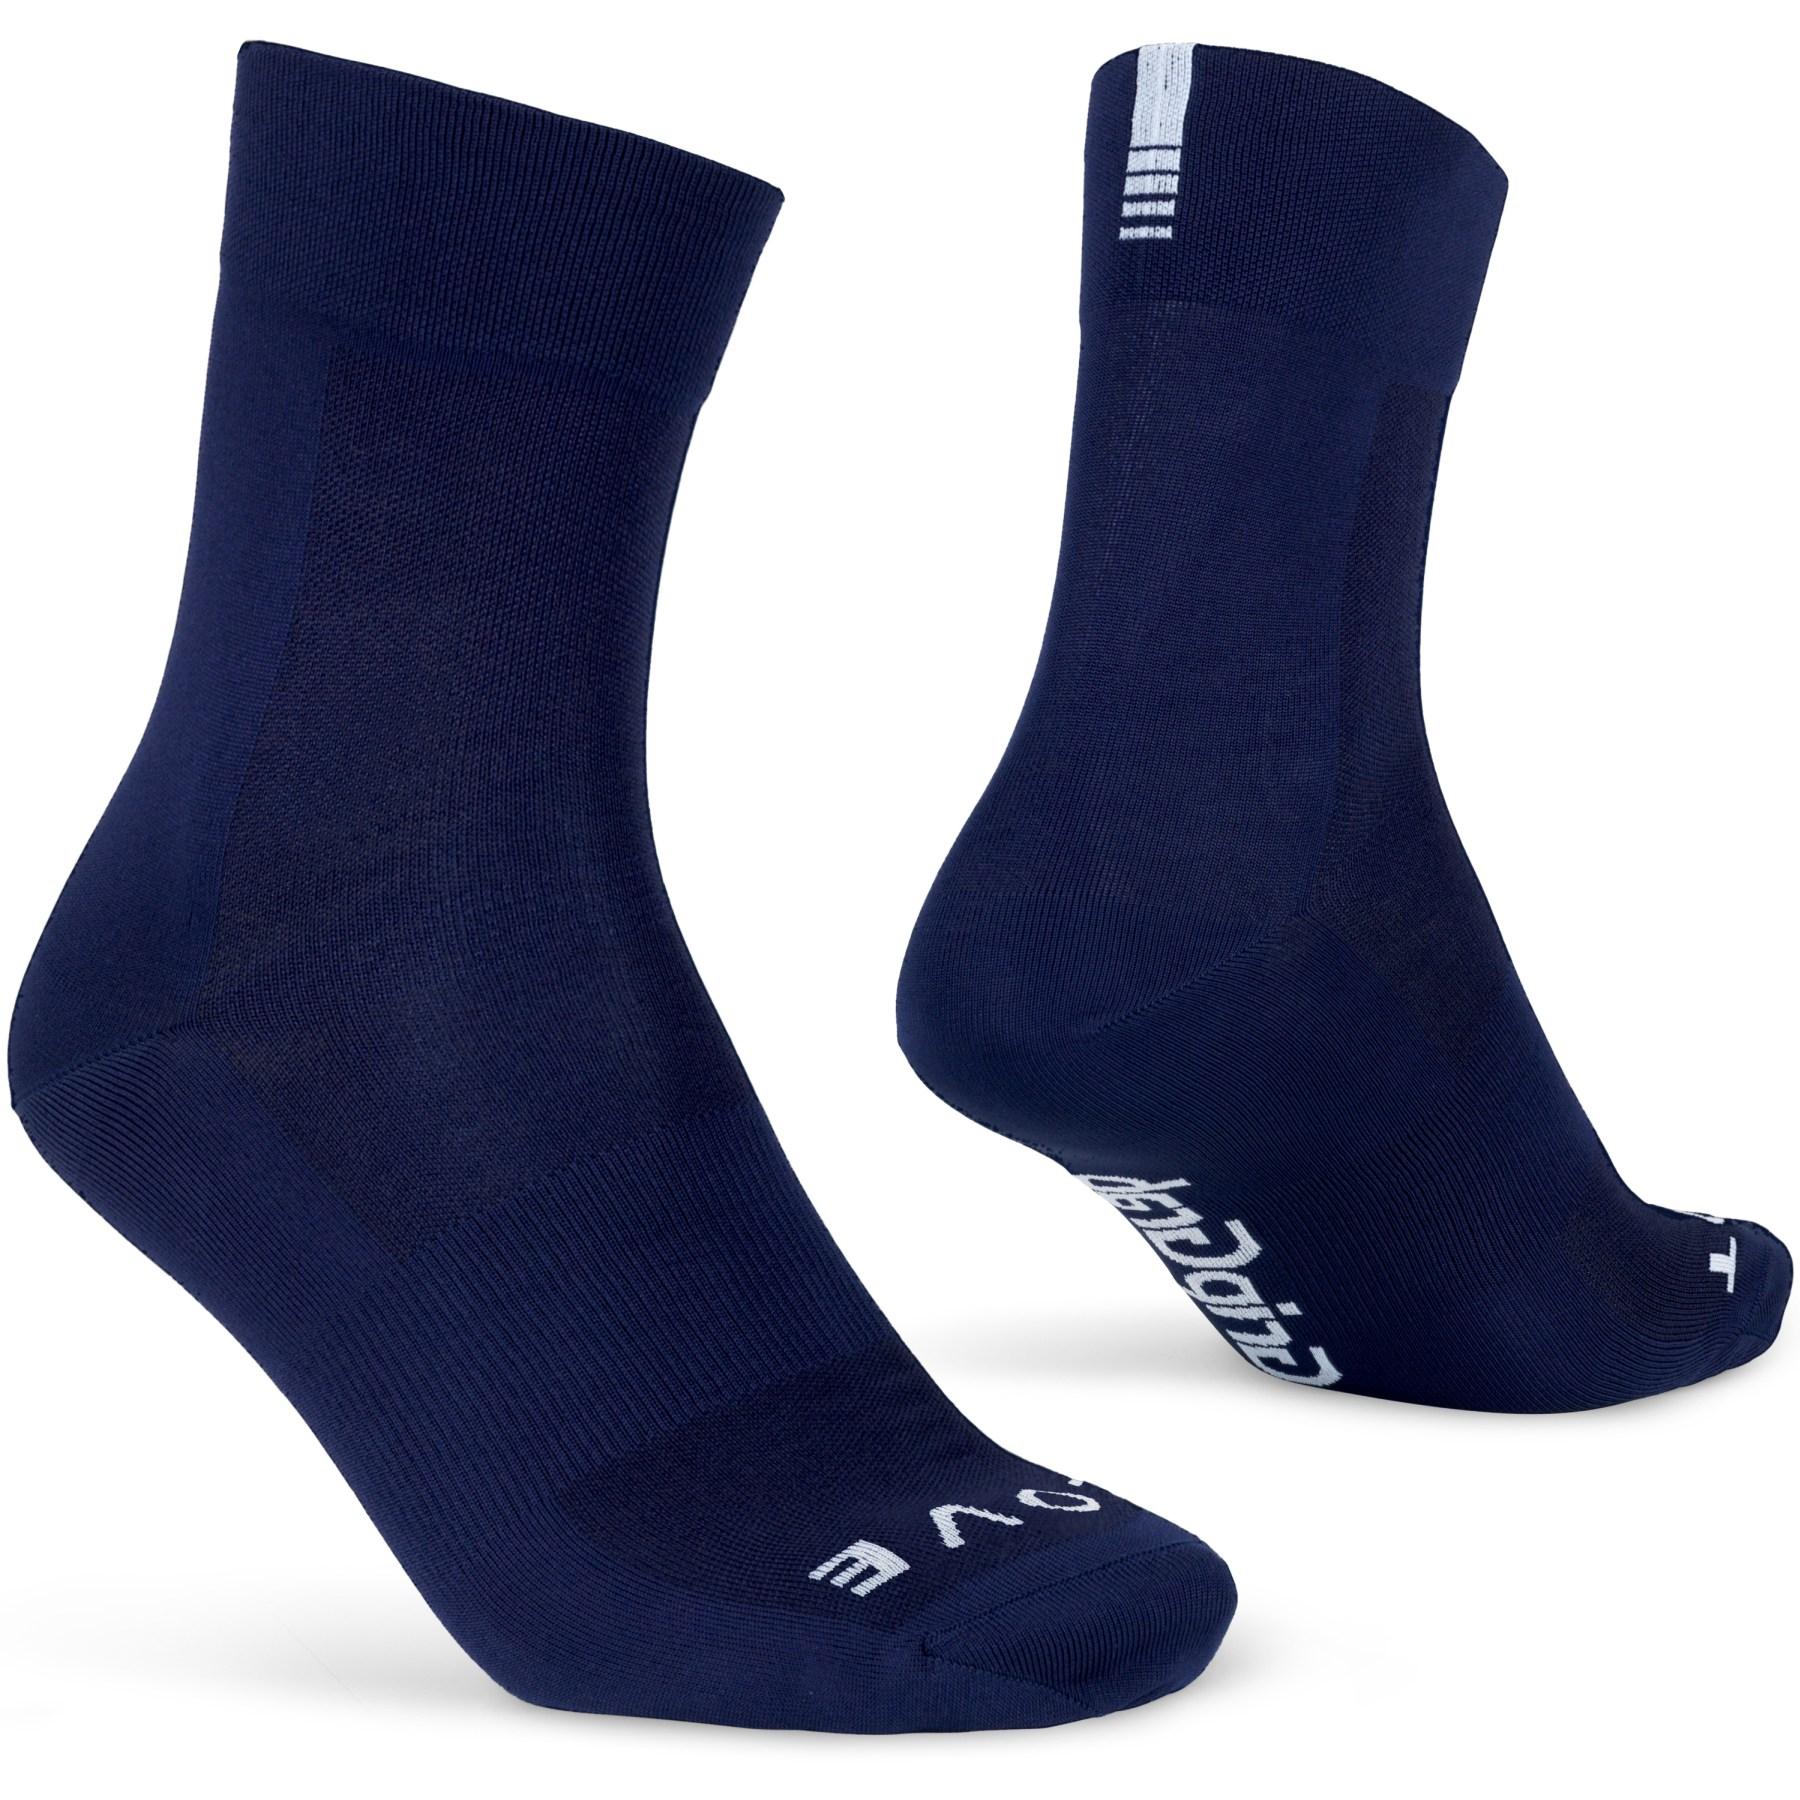 GripGrab Lightweight SL Sock - Navy Blue